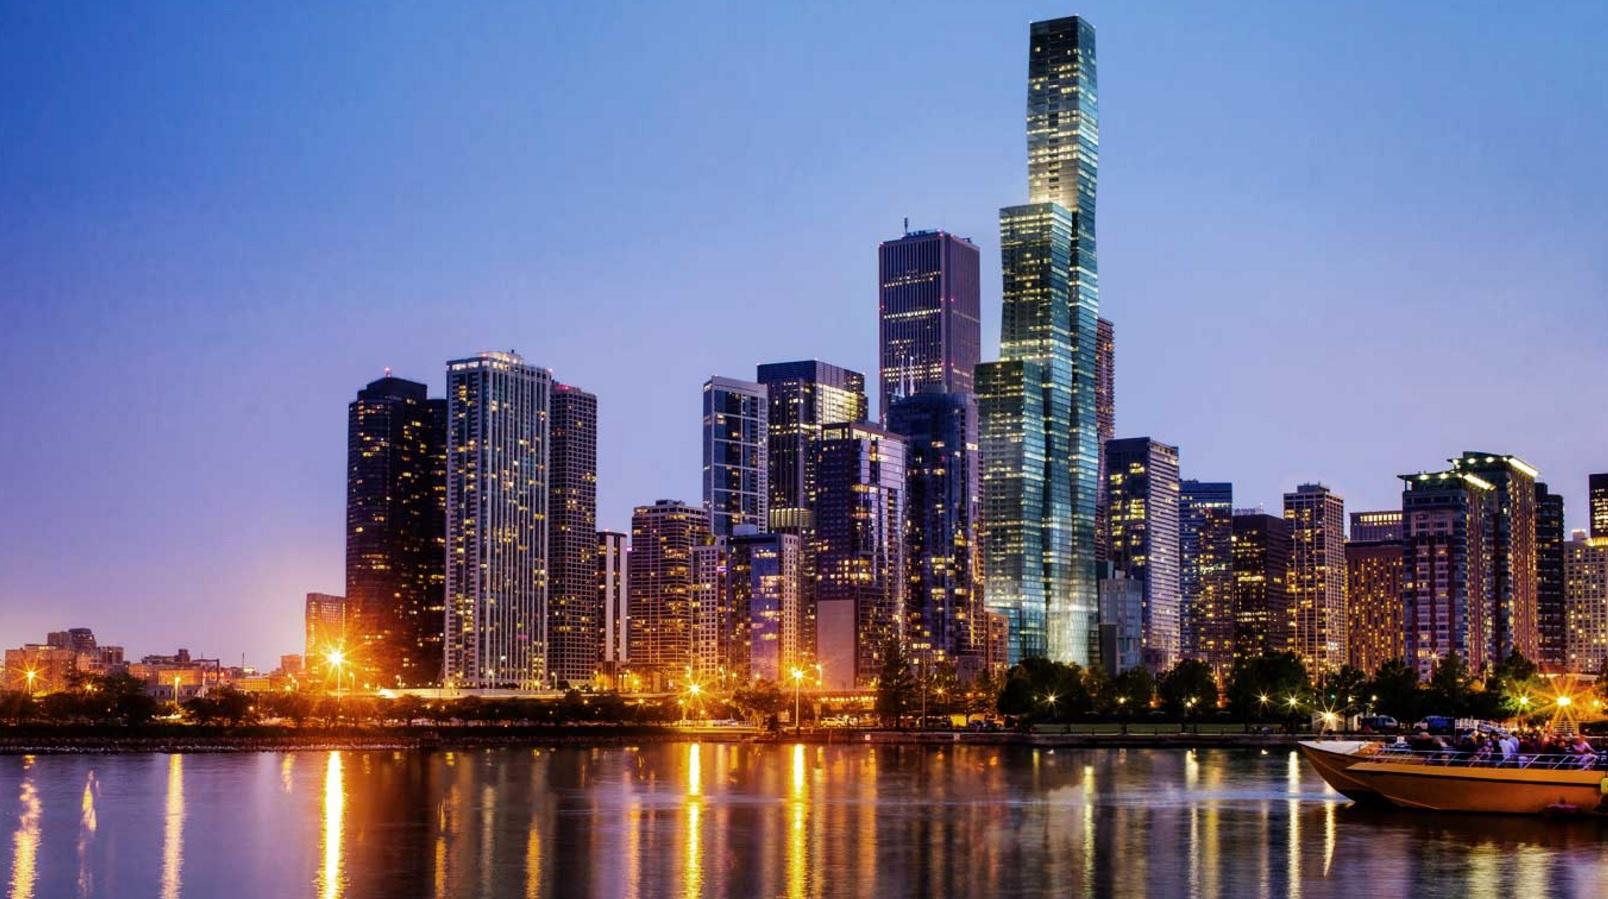 Chicago Skyline with Vista Tower rendering